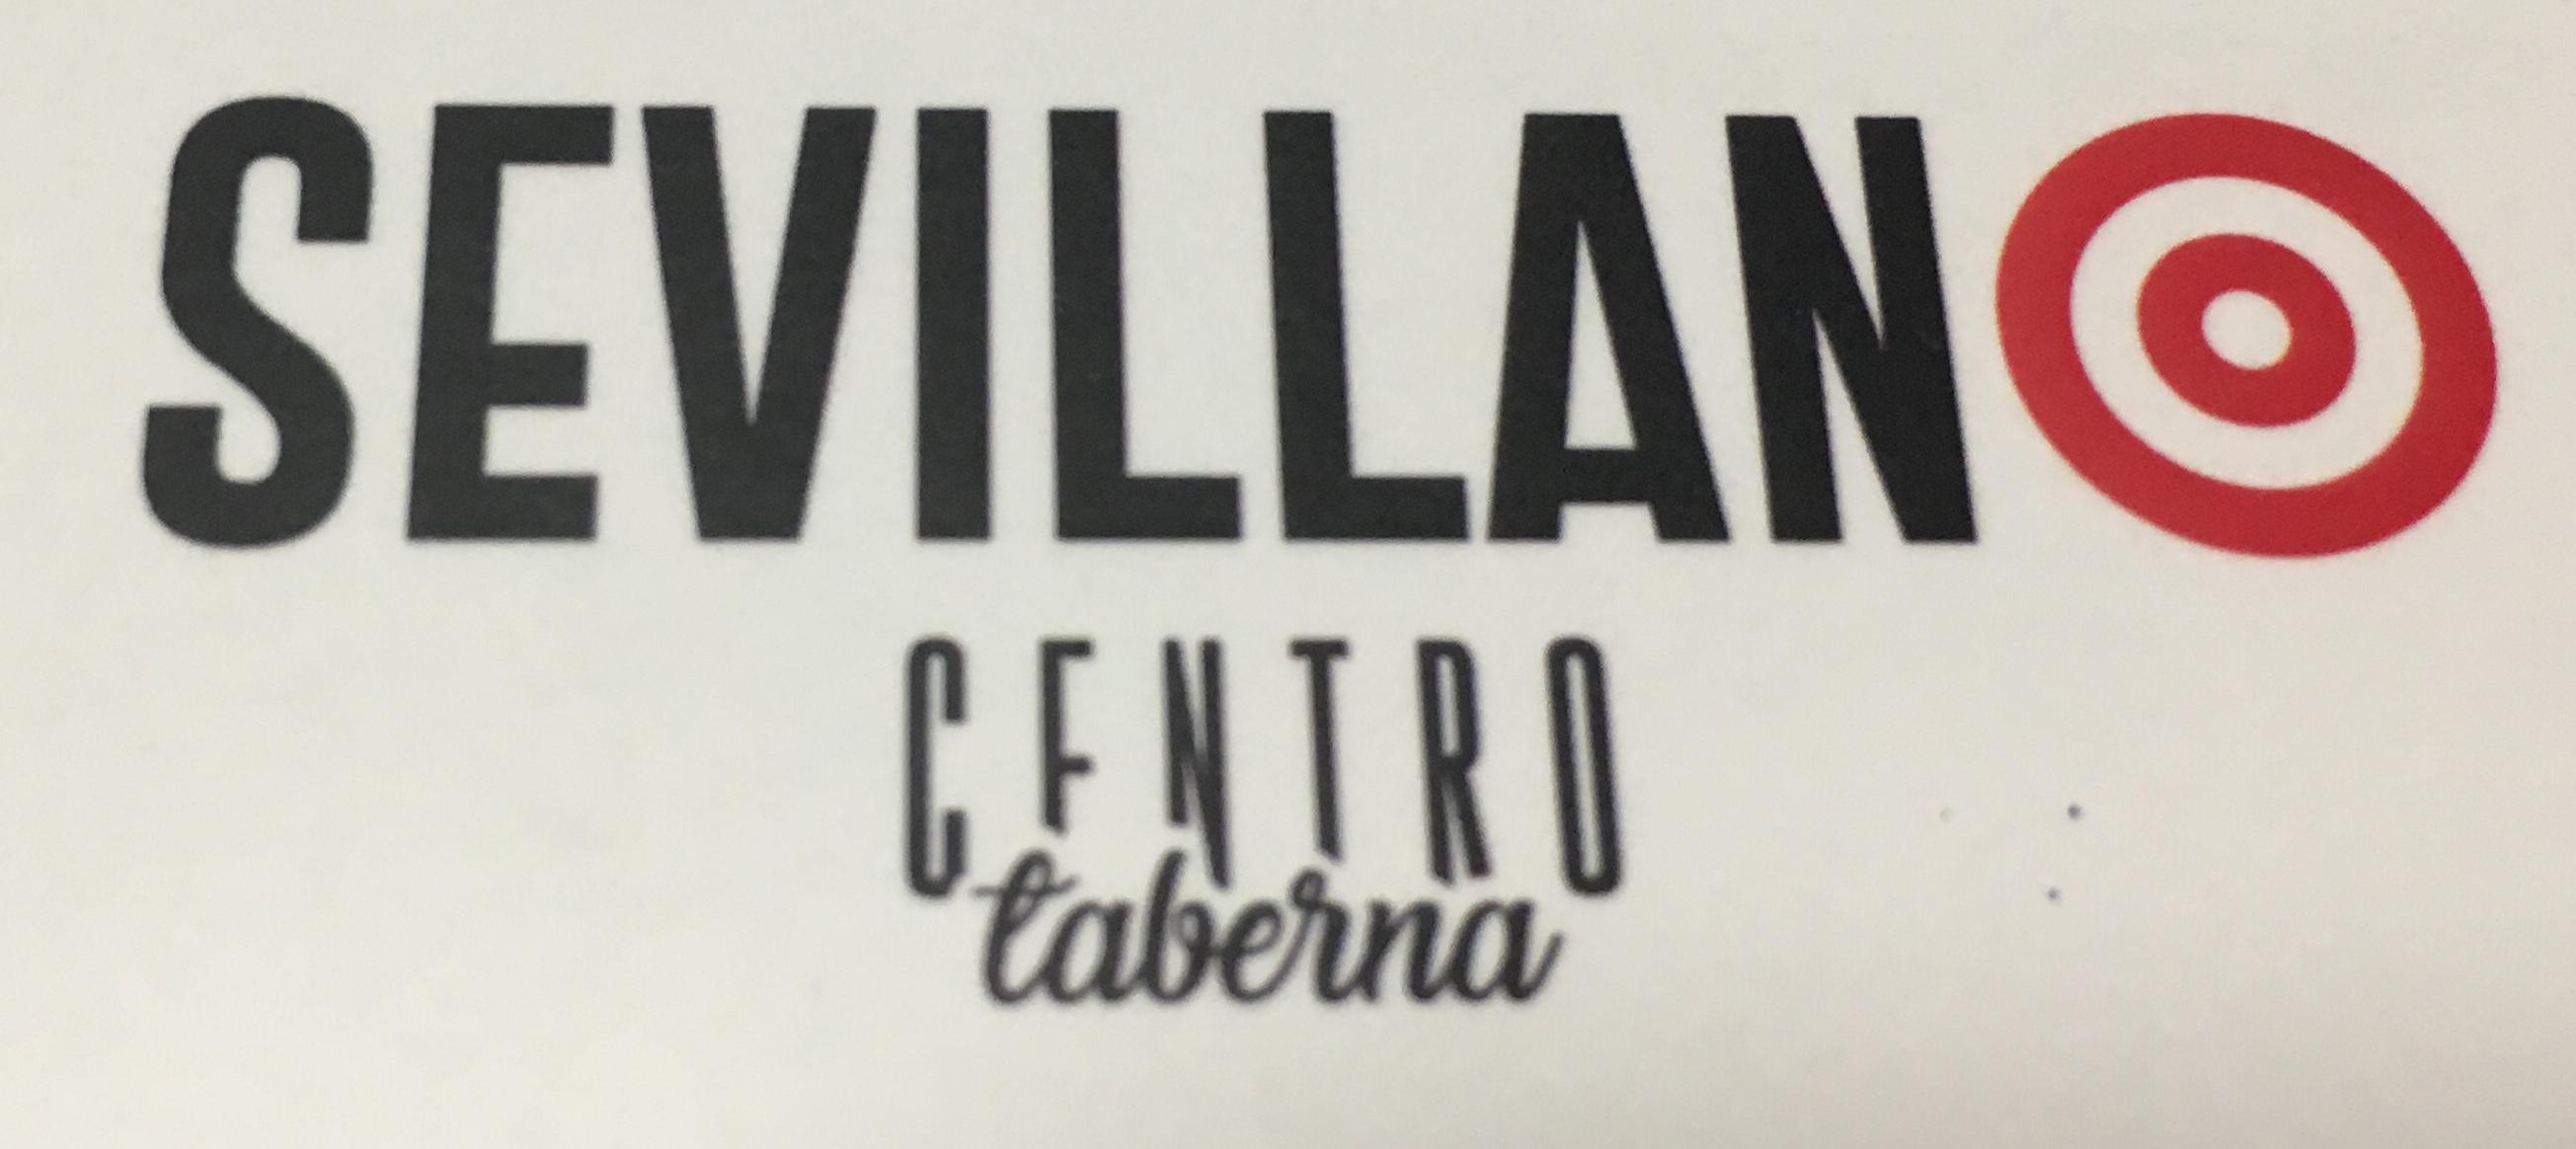 Sevillano Centro